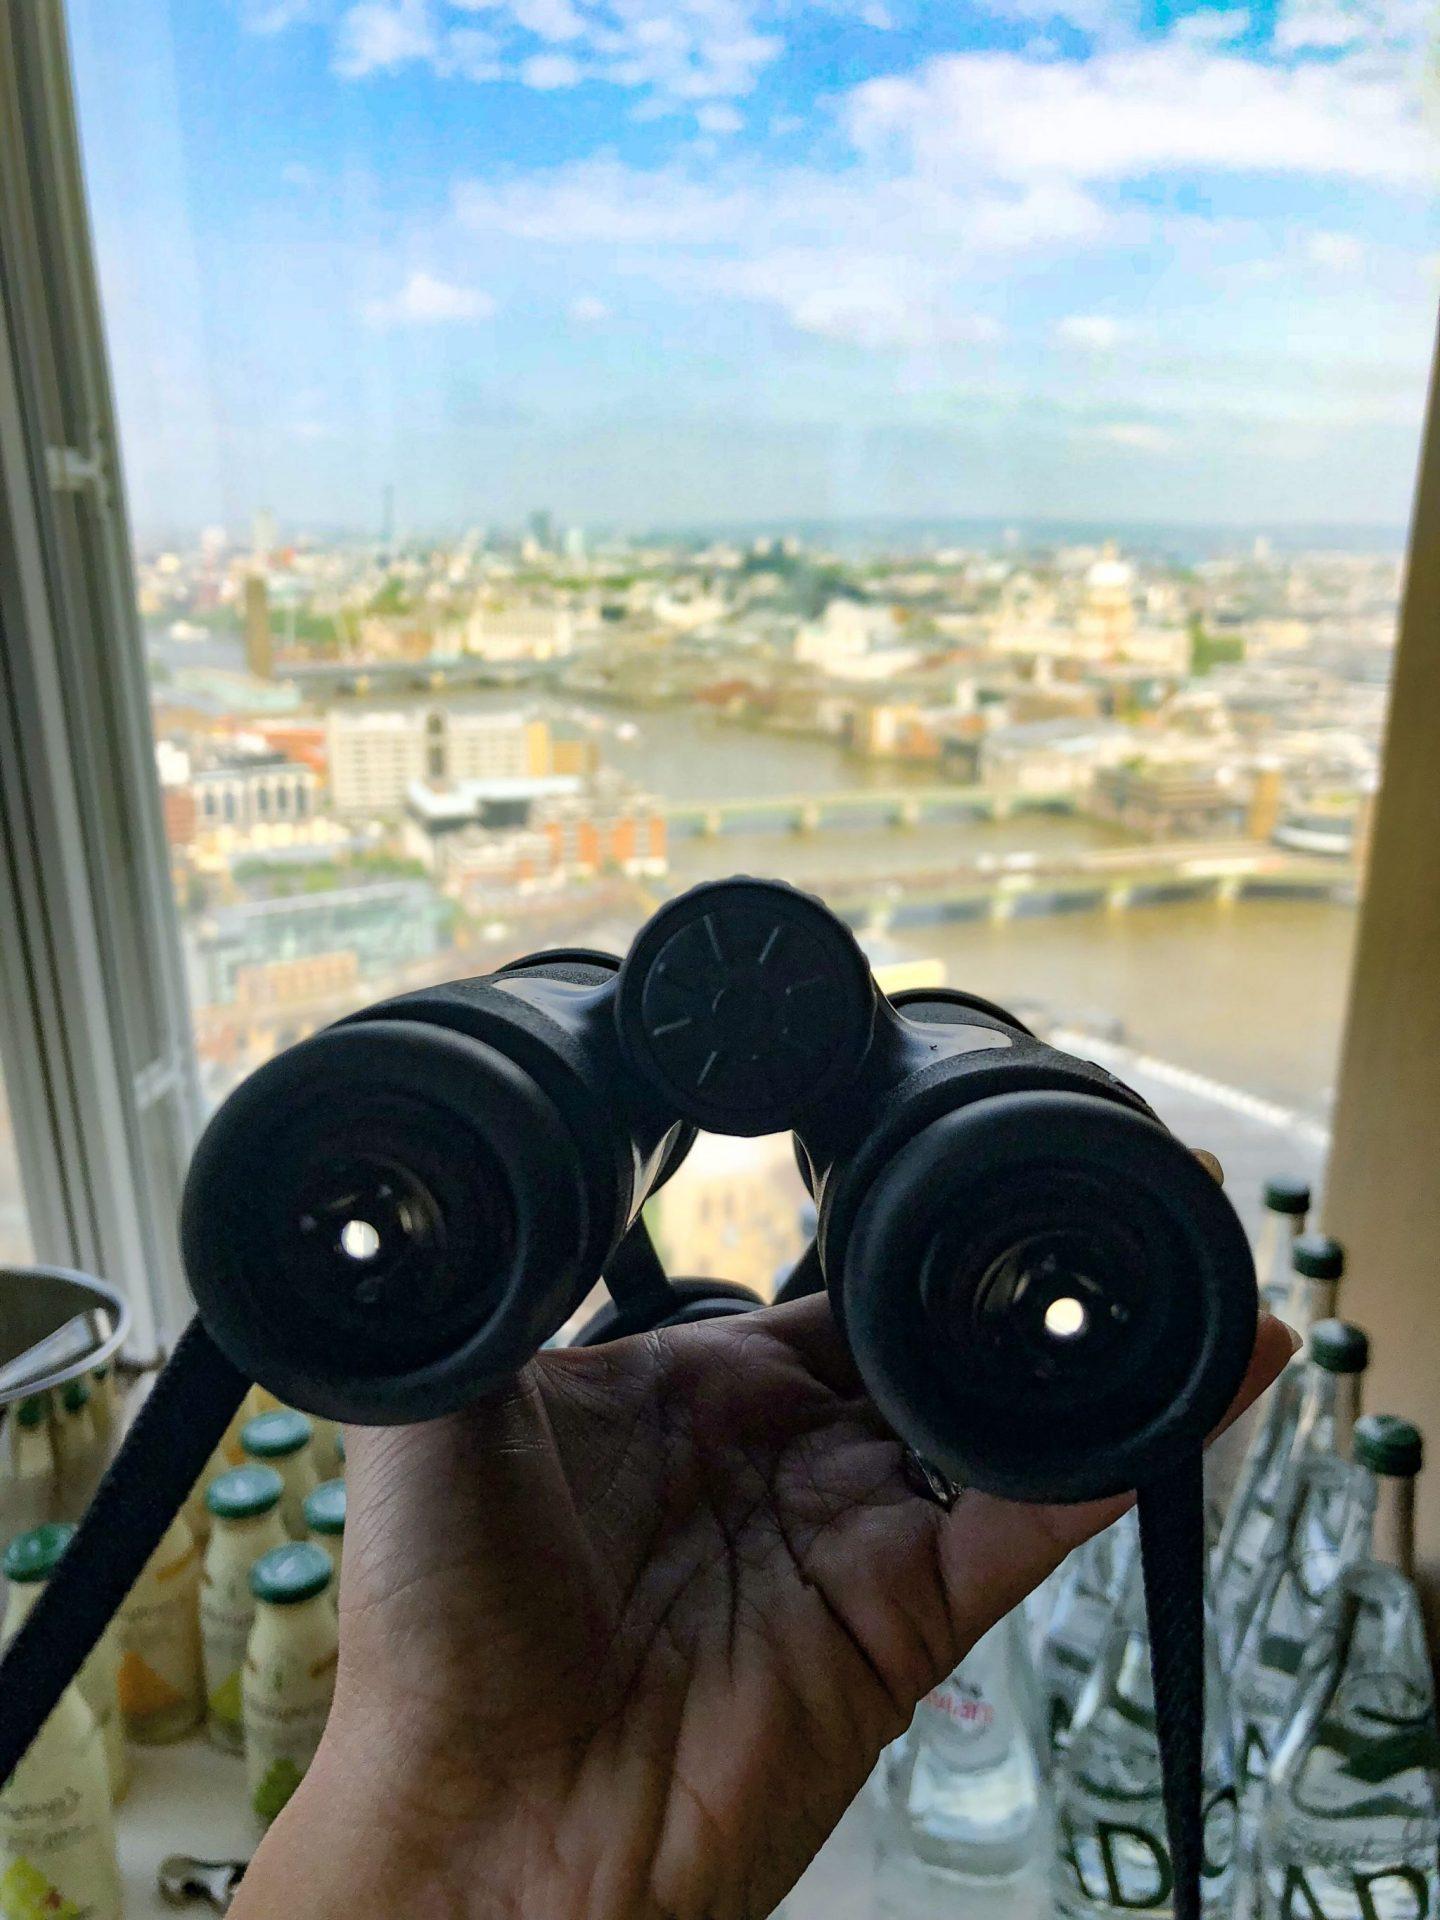 A tour around London to #seetheunseen with Swarovski Optik and Small Car Big City